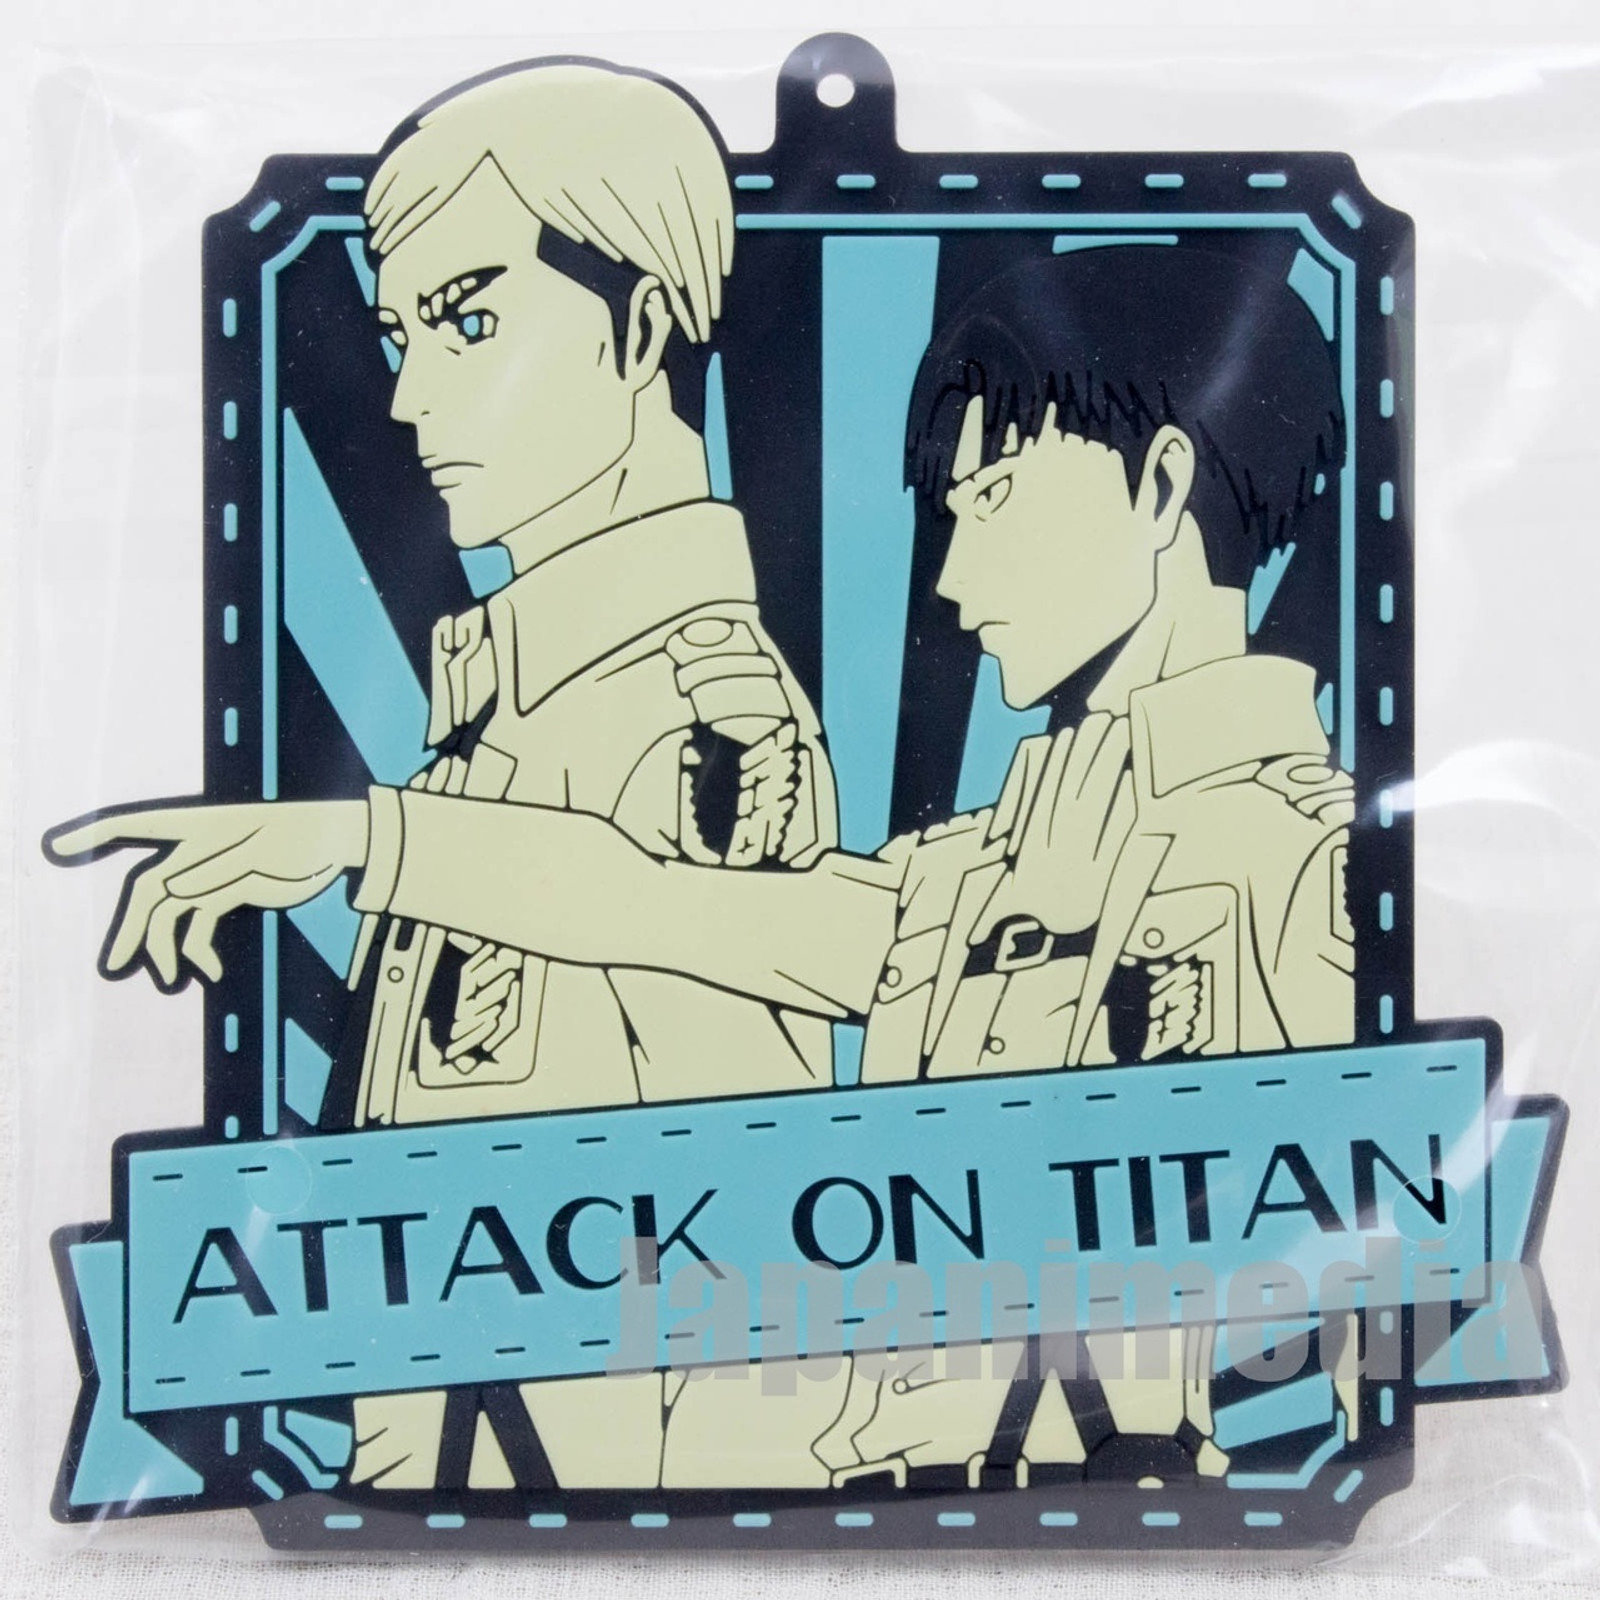 Attack on Titan Rubber Coaster Erwin Smith & Levi Banpresto JAPAN ANIME MANGA